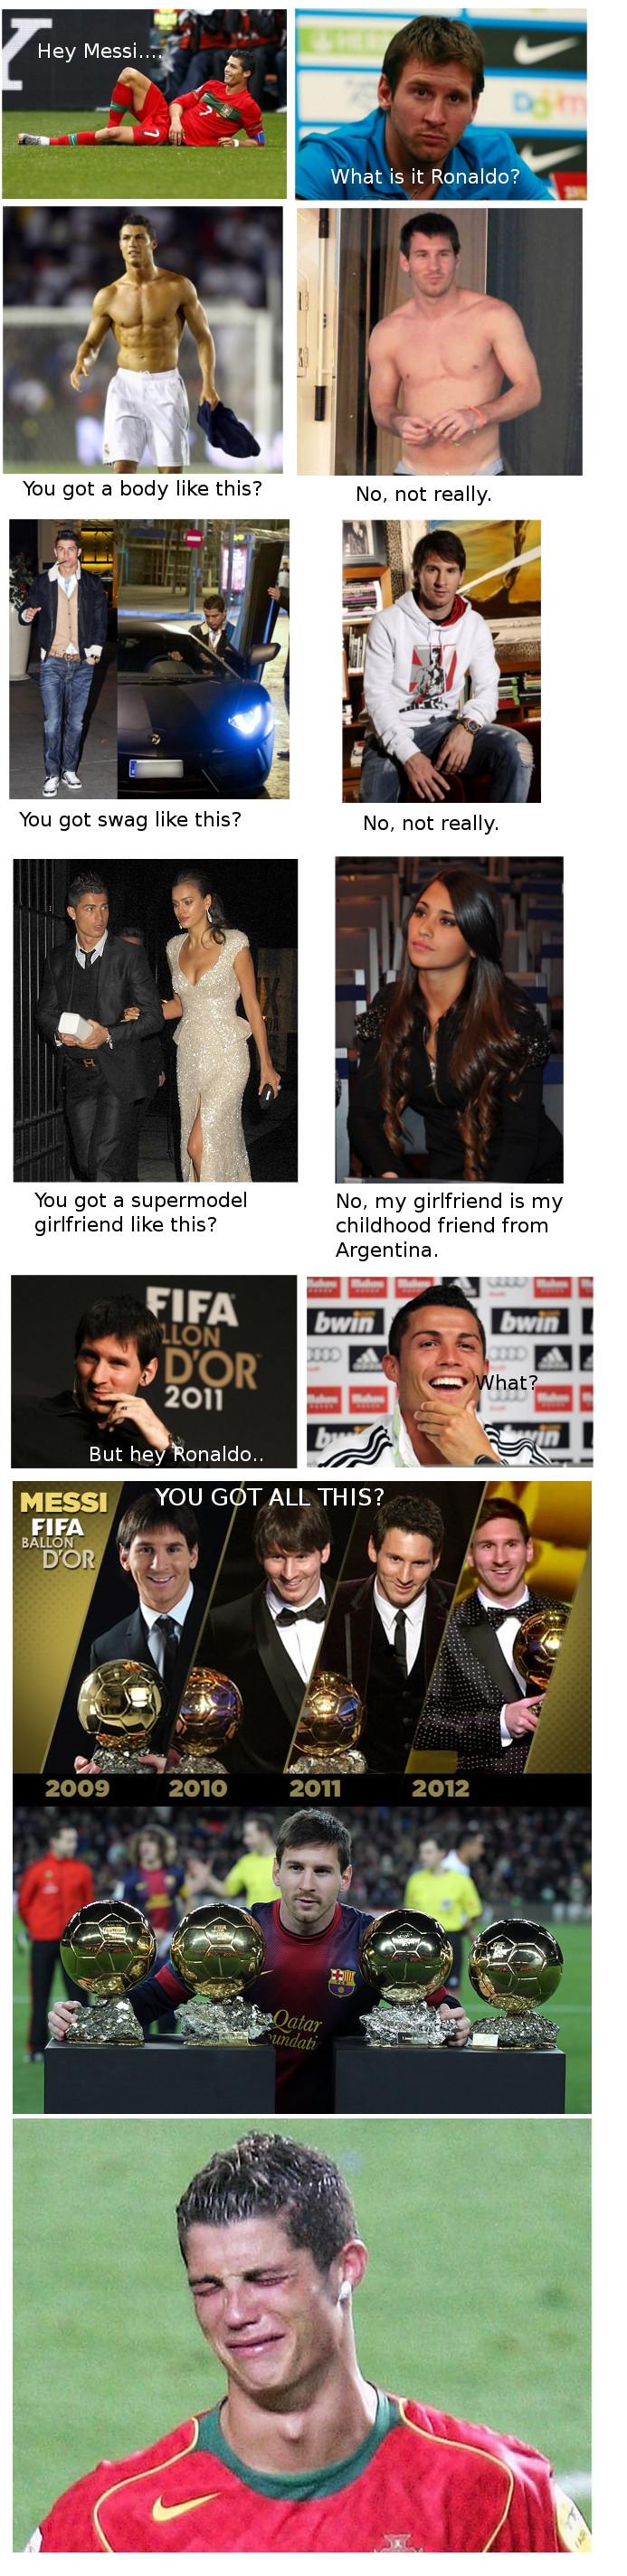 the endless debate between Messi and Ronaldo